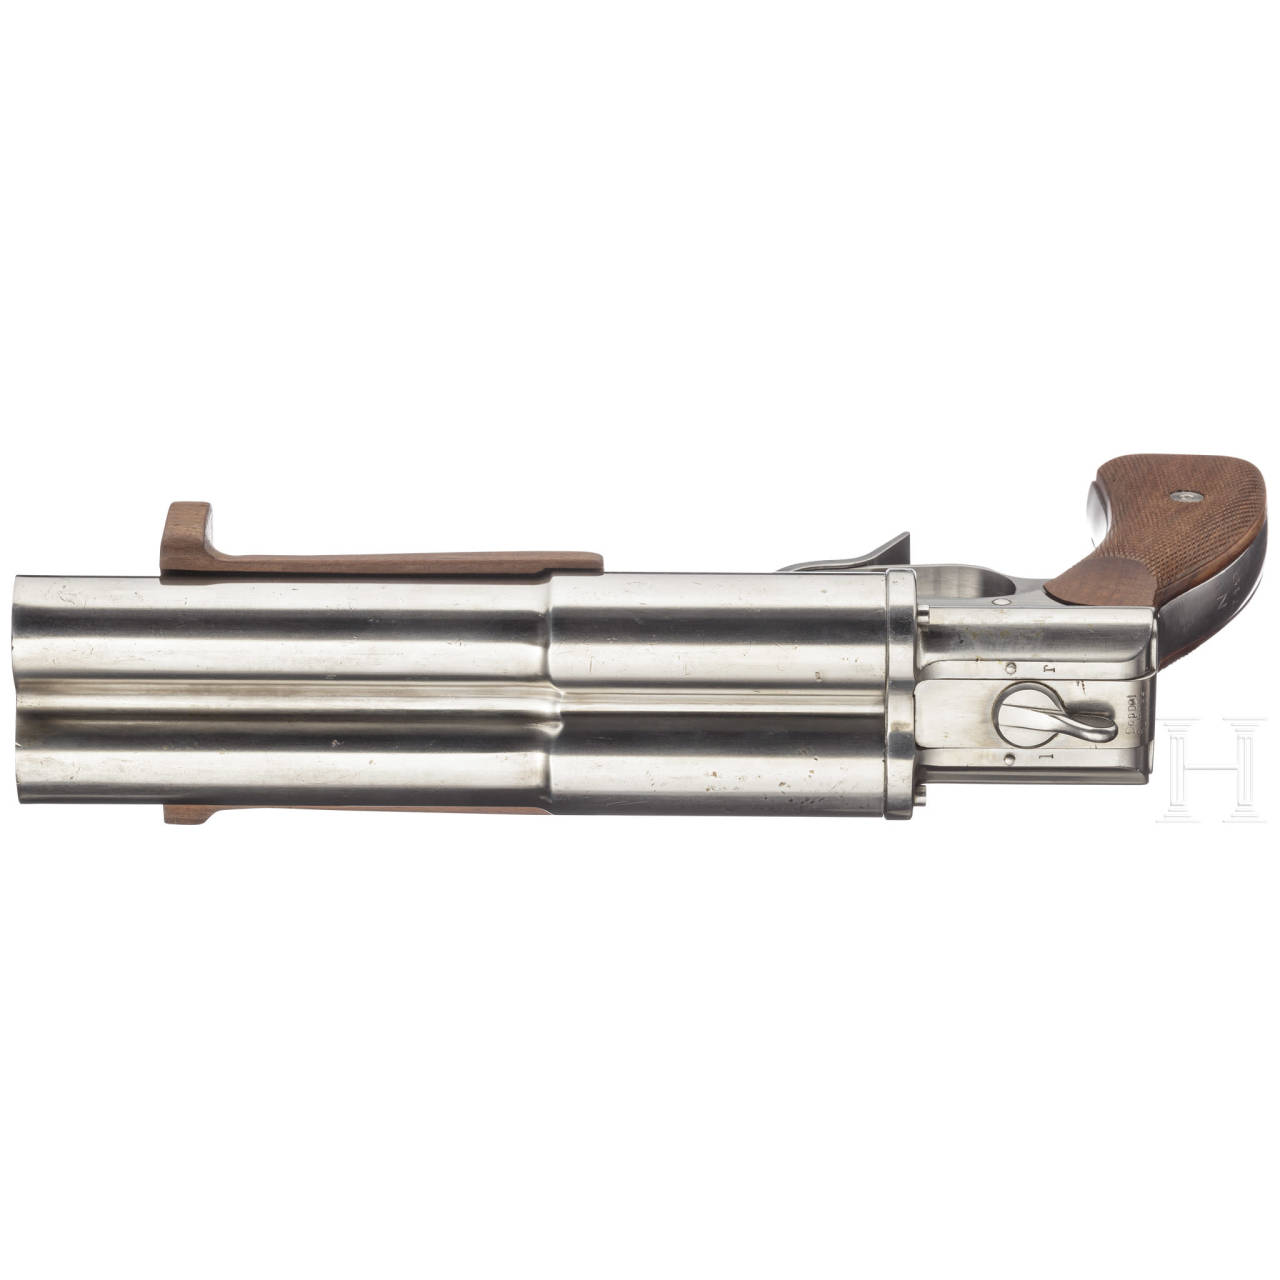 A Walther SLd flare gun